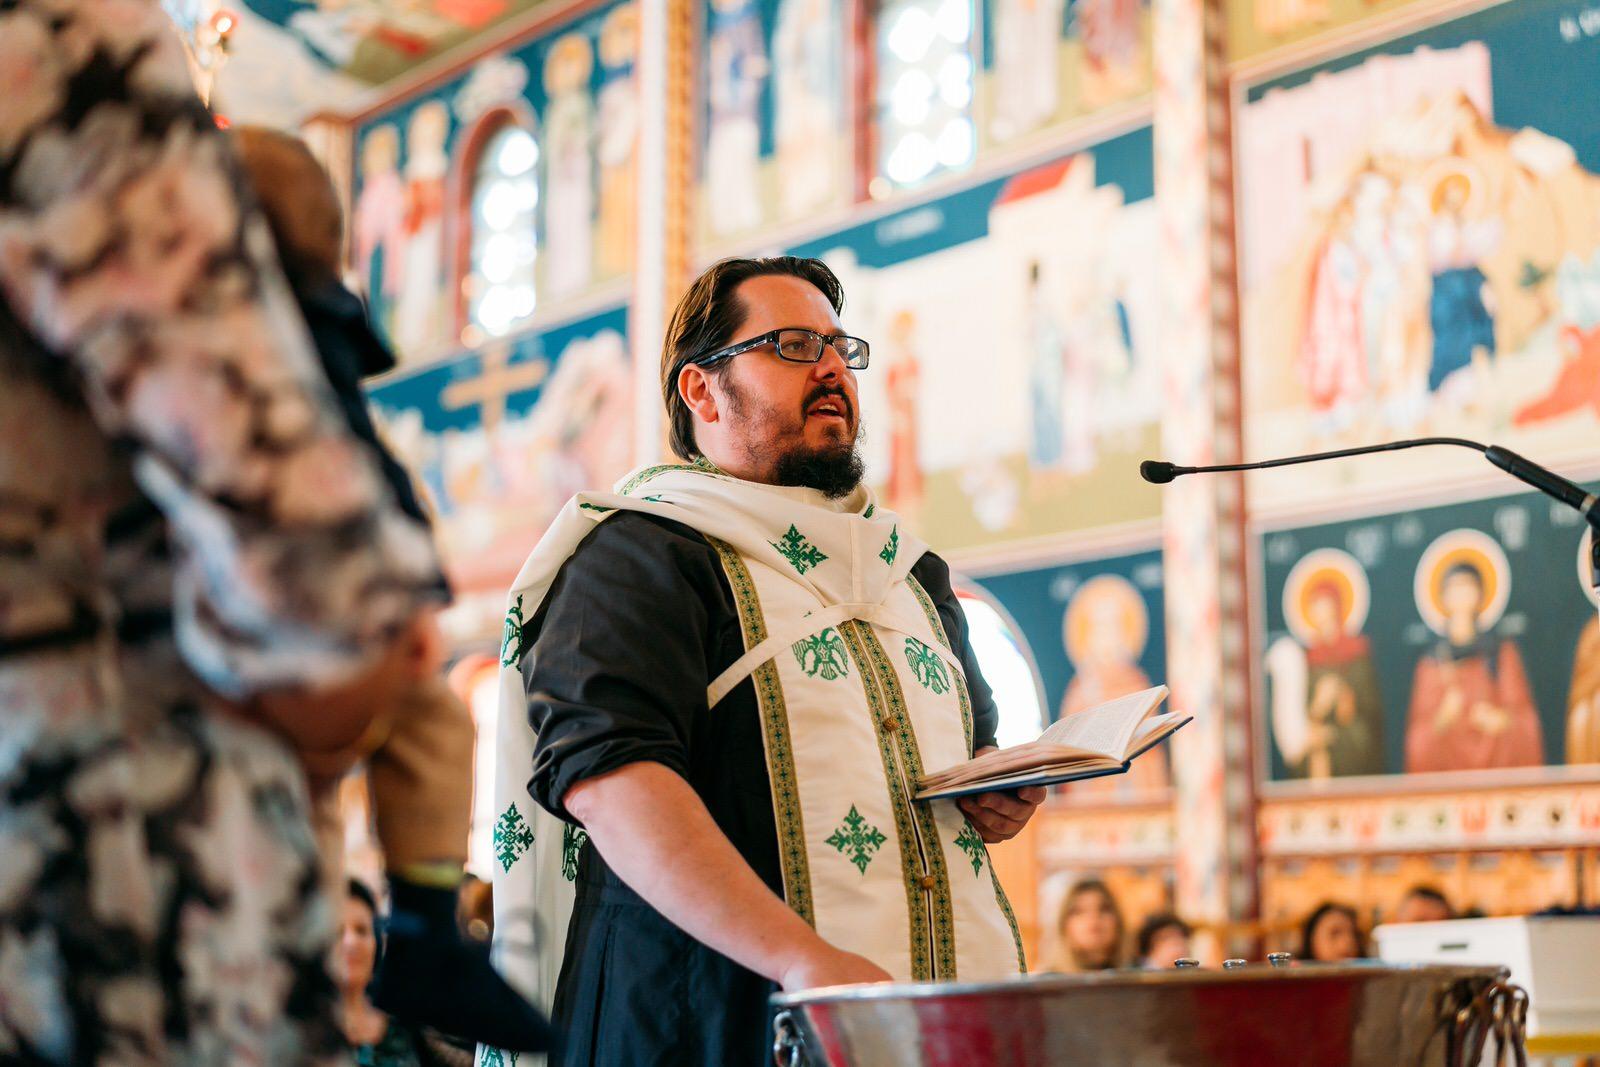 yianni-baptism-st-catherine-orthodox-mascot-laqua-76